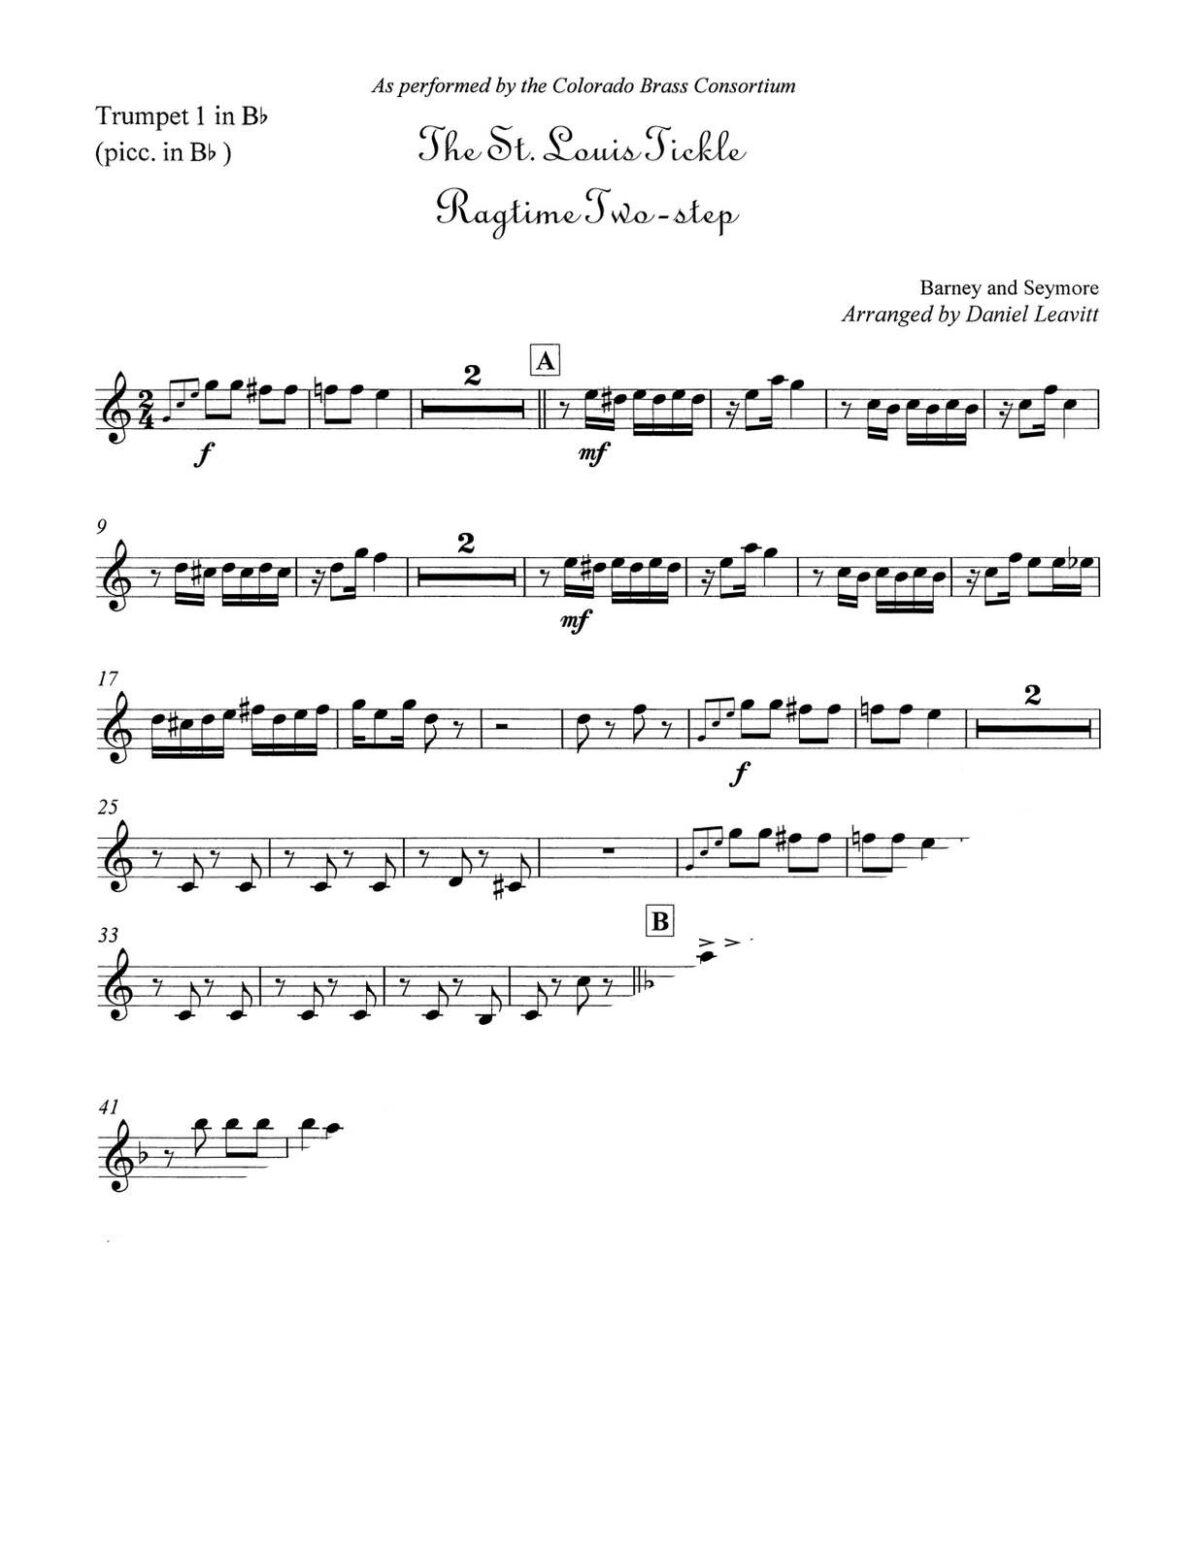 Seymore arr. Leavitt, The St. Louis Tickle Ragtime Two-Step brass quintet-p03